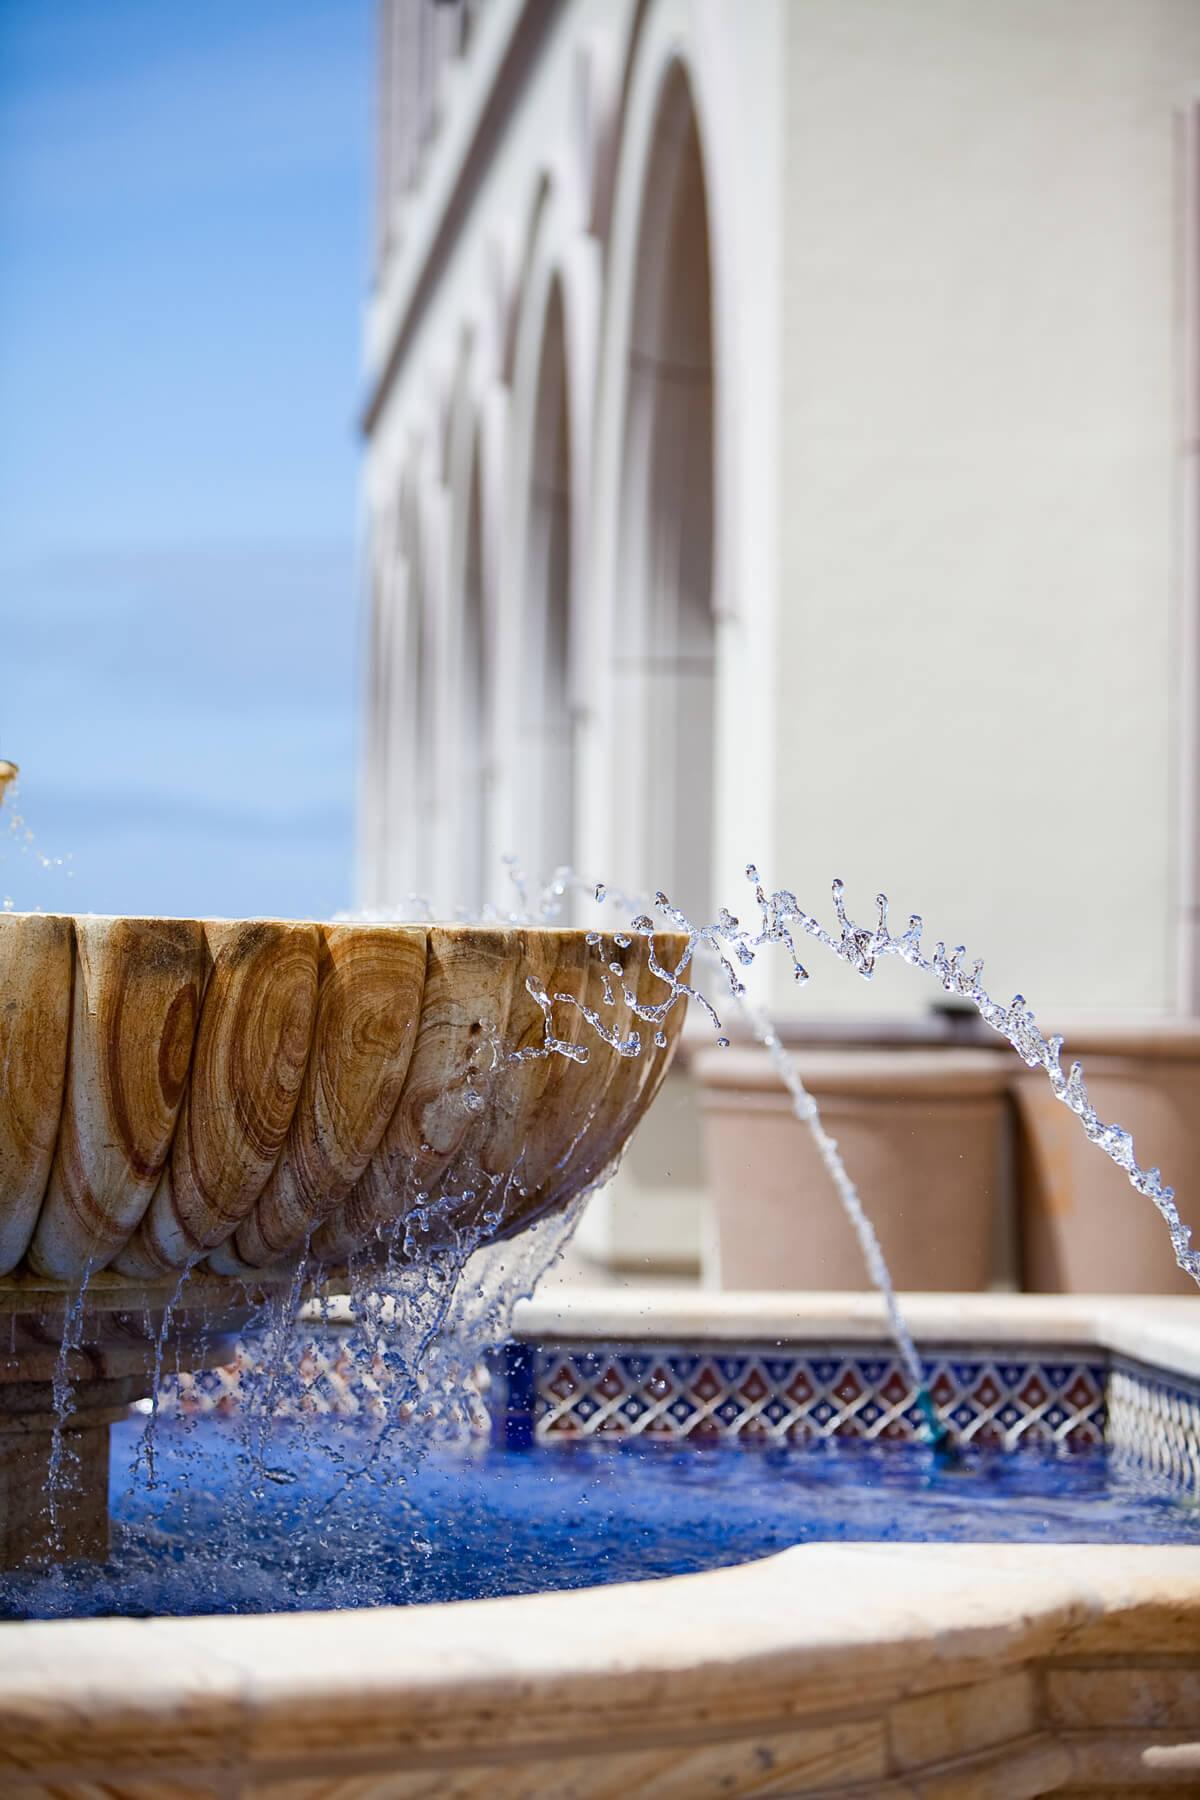 water fountain drops